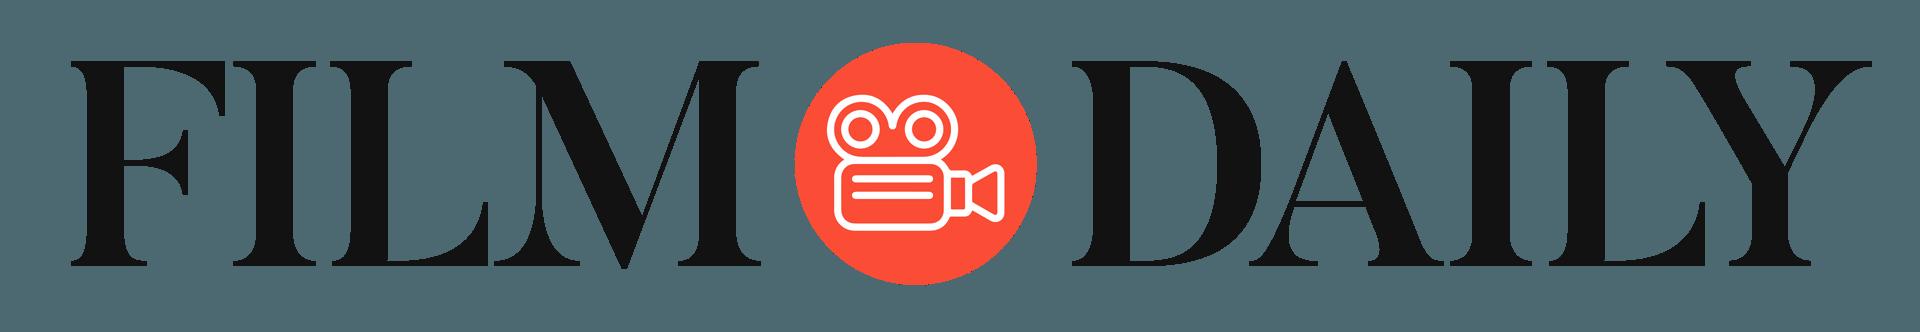 Contributors daily . Clipart tv film tv